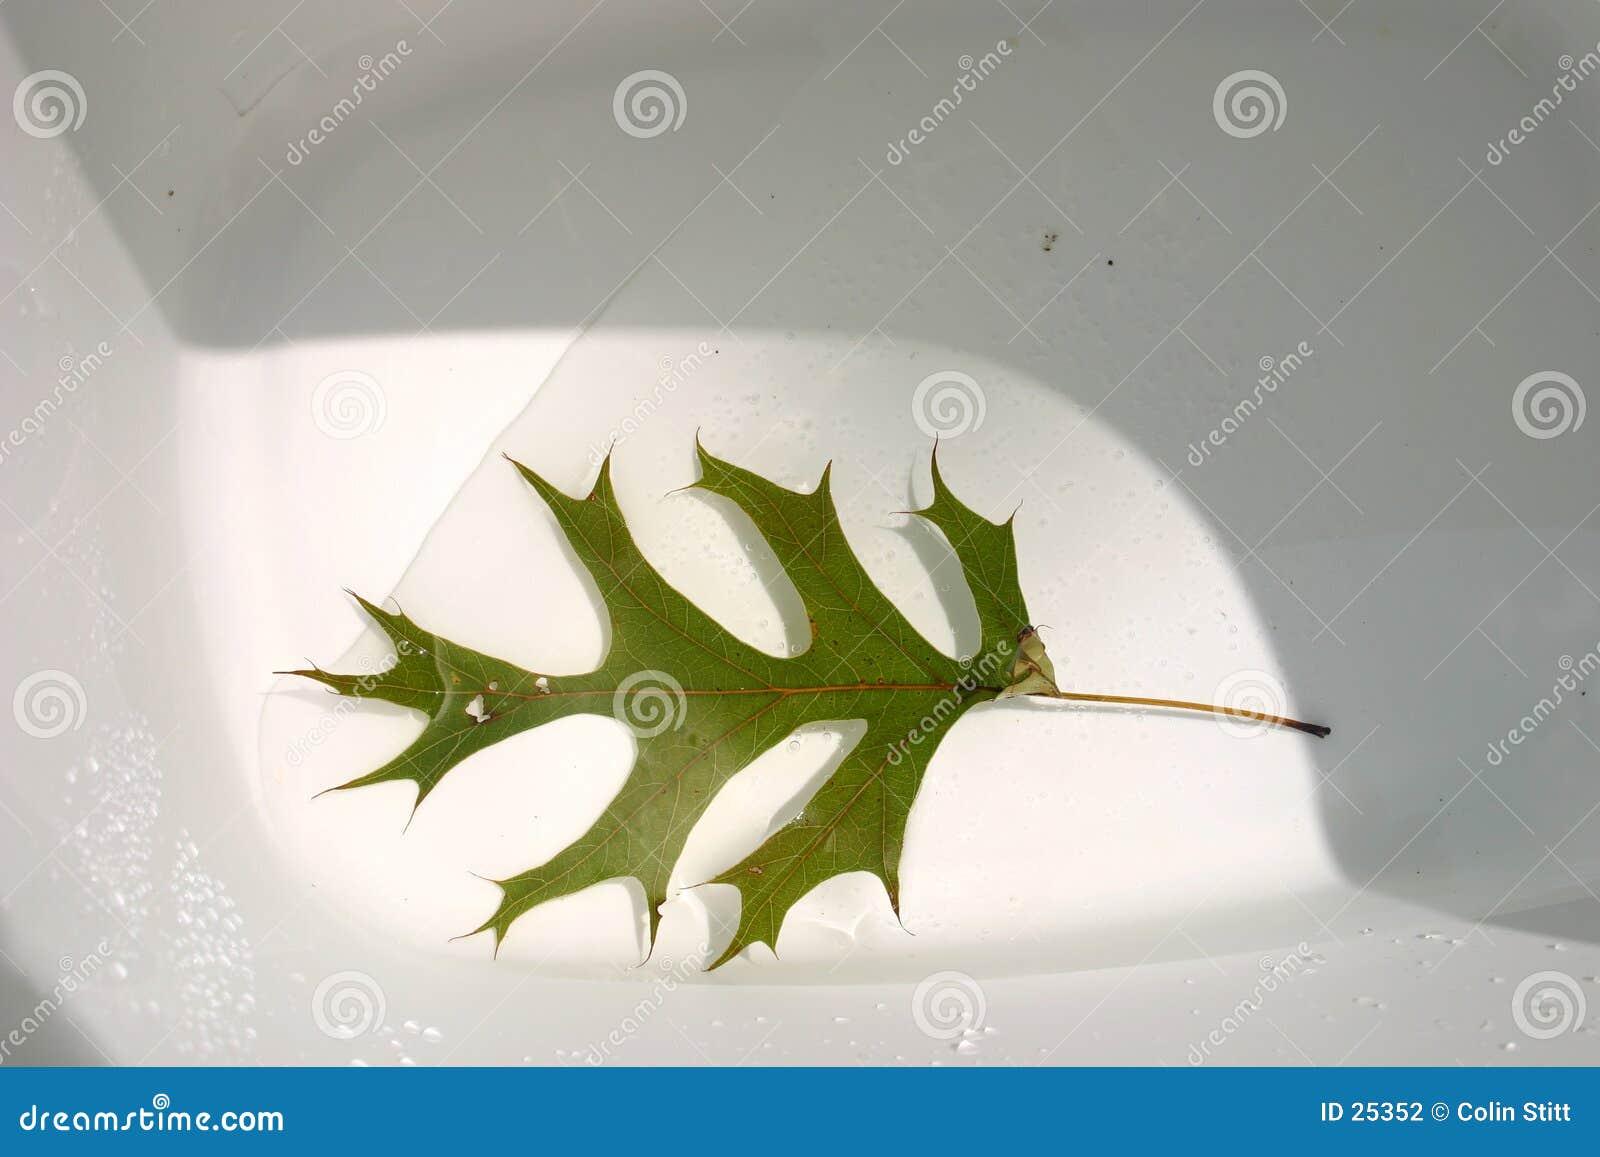 Leaf in a bucket